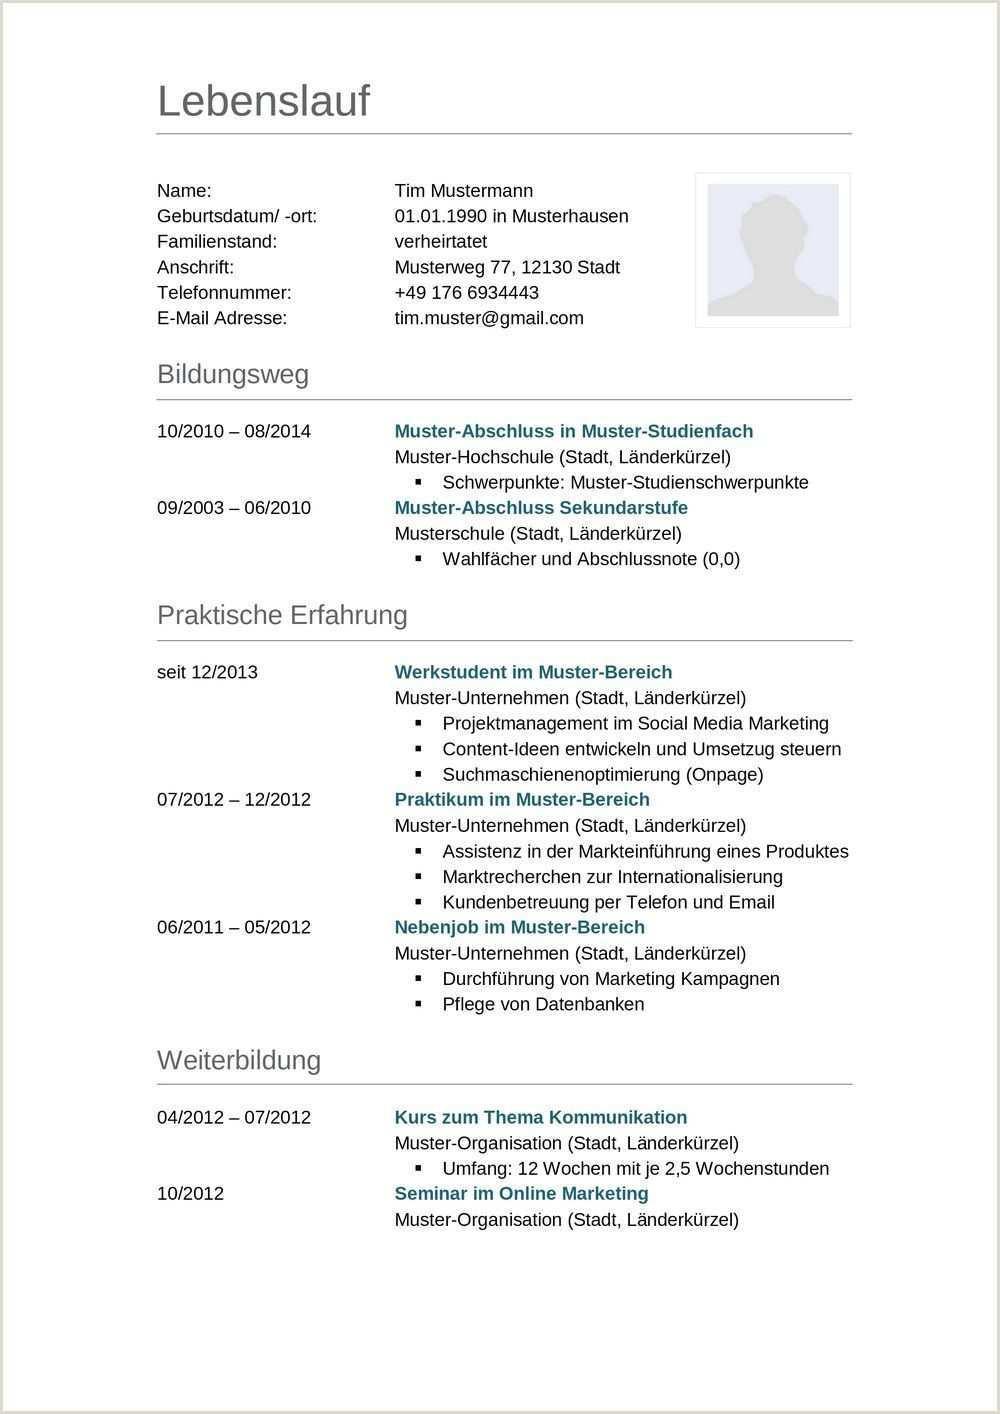 Lebenslauf Muster Schuler Nebenjob In 2020 Resume Words Resume Template Free Resume Template